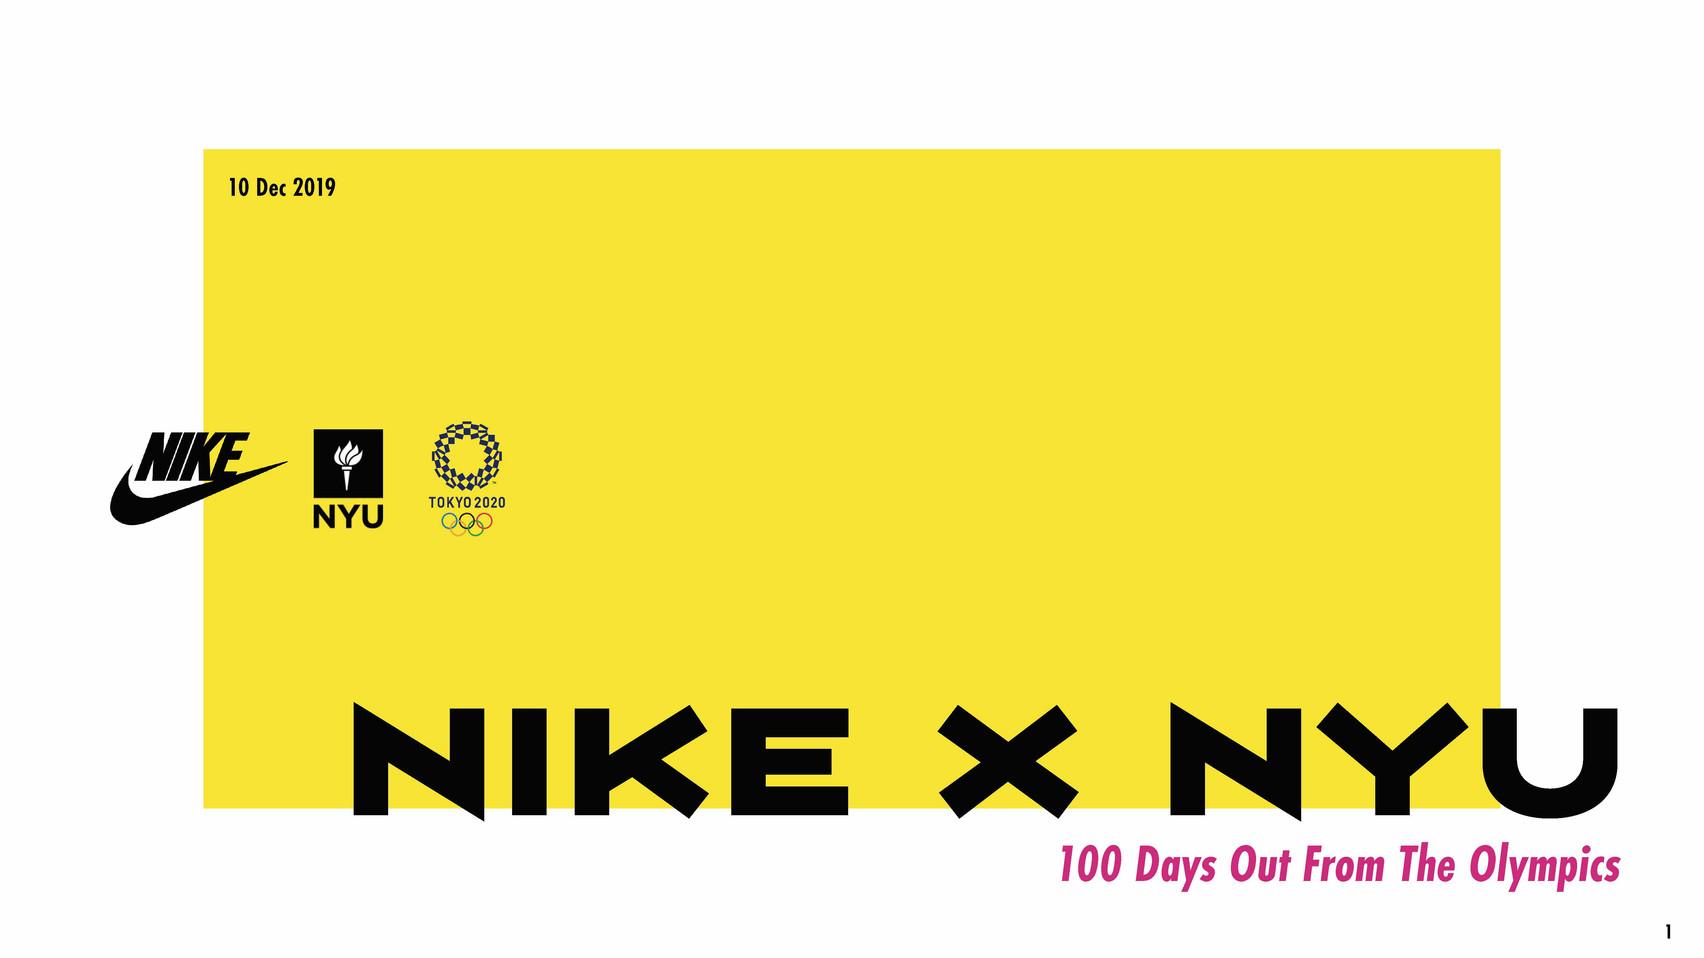 NikexNYU_superfly_2019_Page_01.jpg